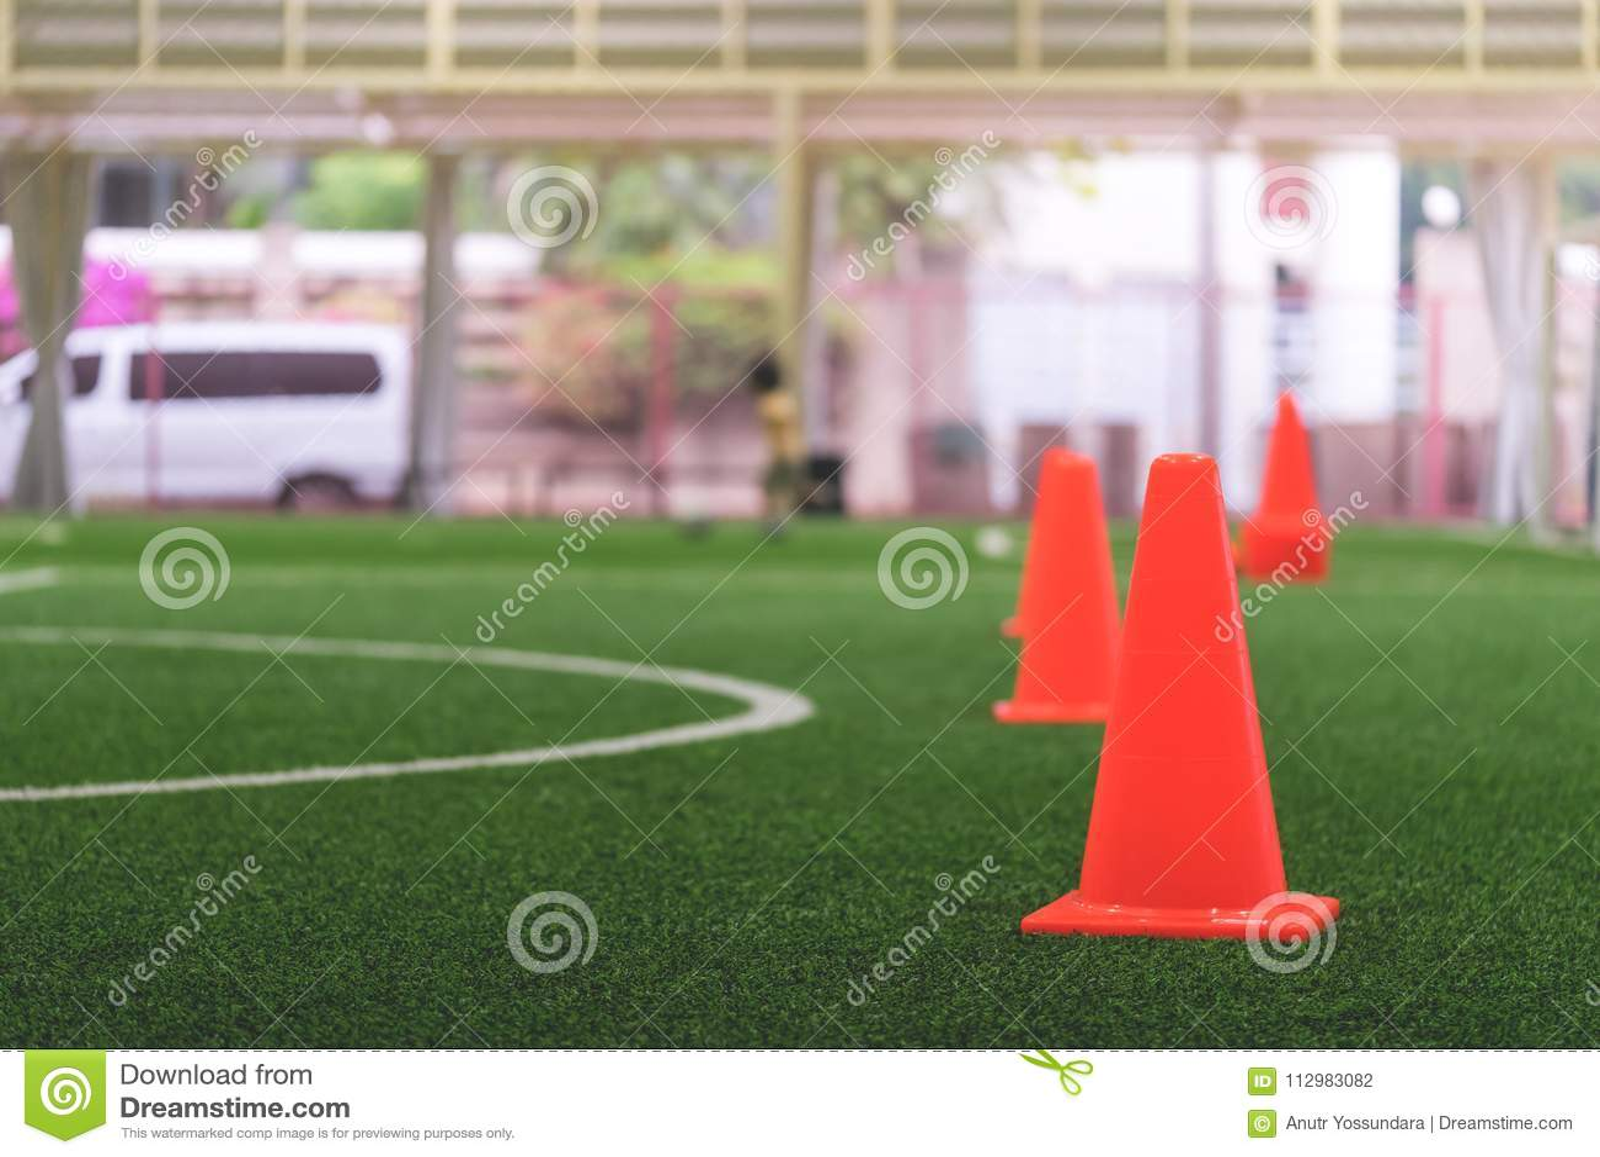 Soccer training equipments on sport training ground